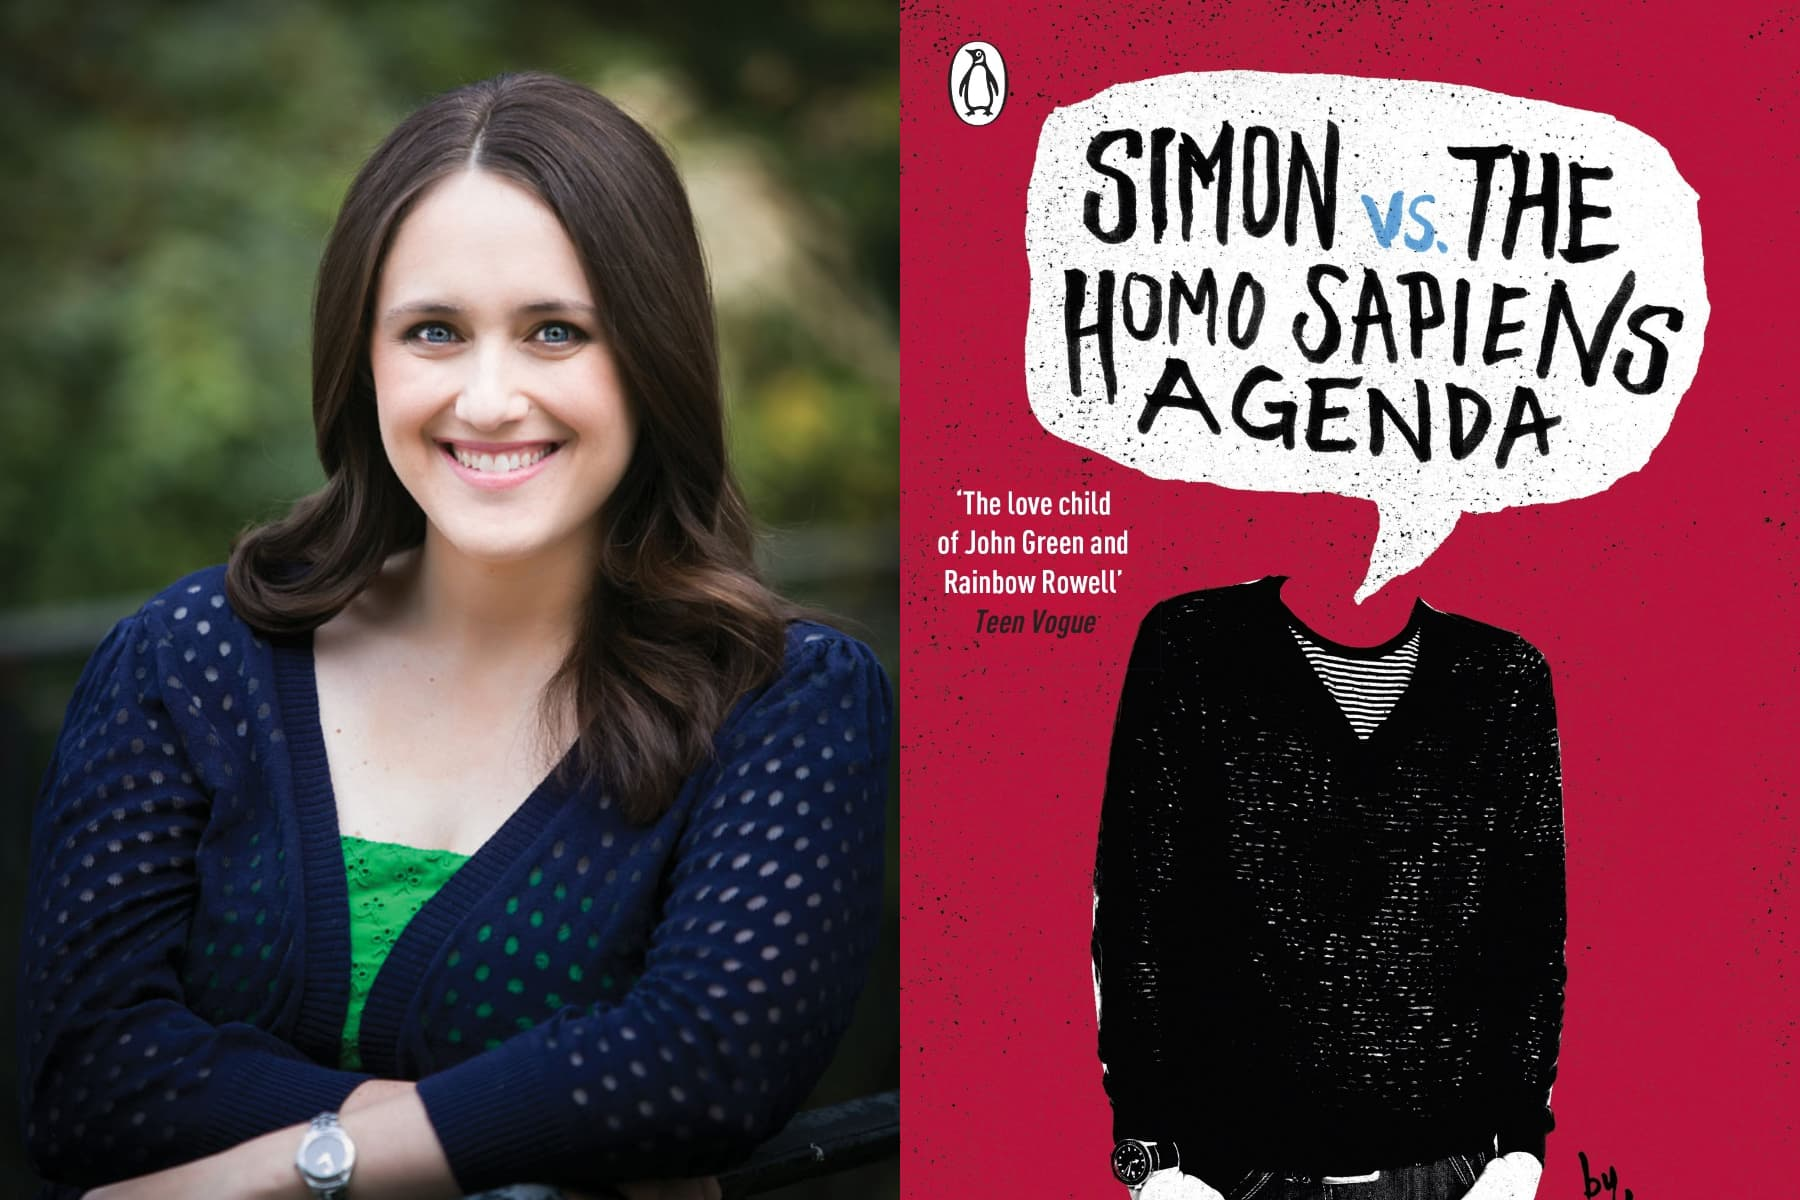 becky albertalli, love simon, simon vs the homo sapiens agenda, bisexual